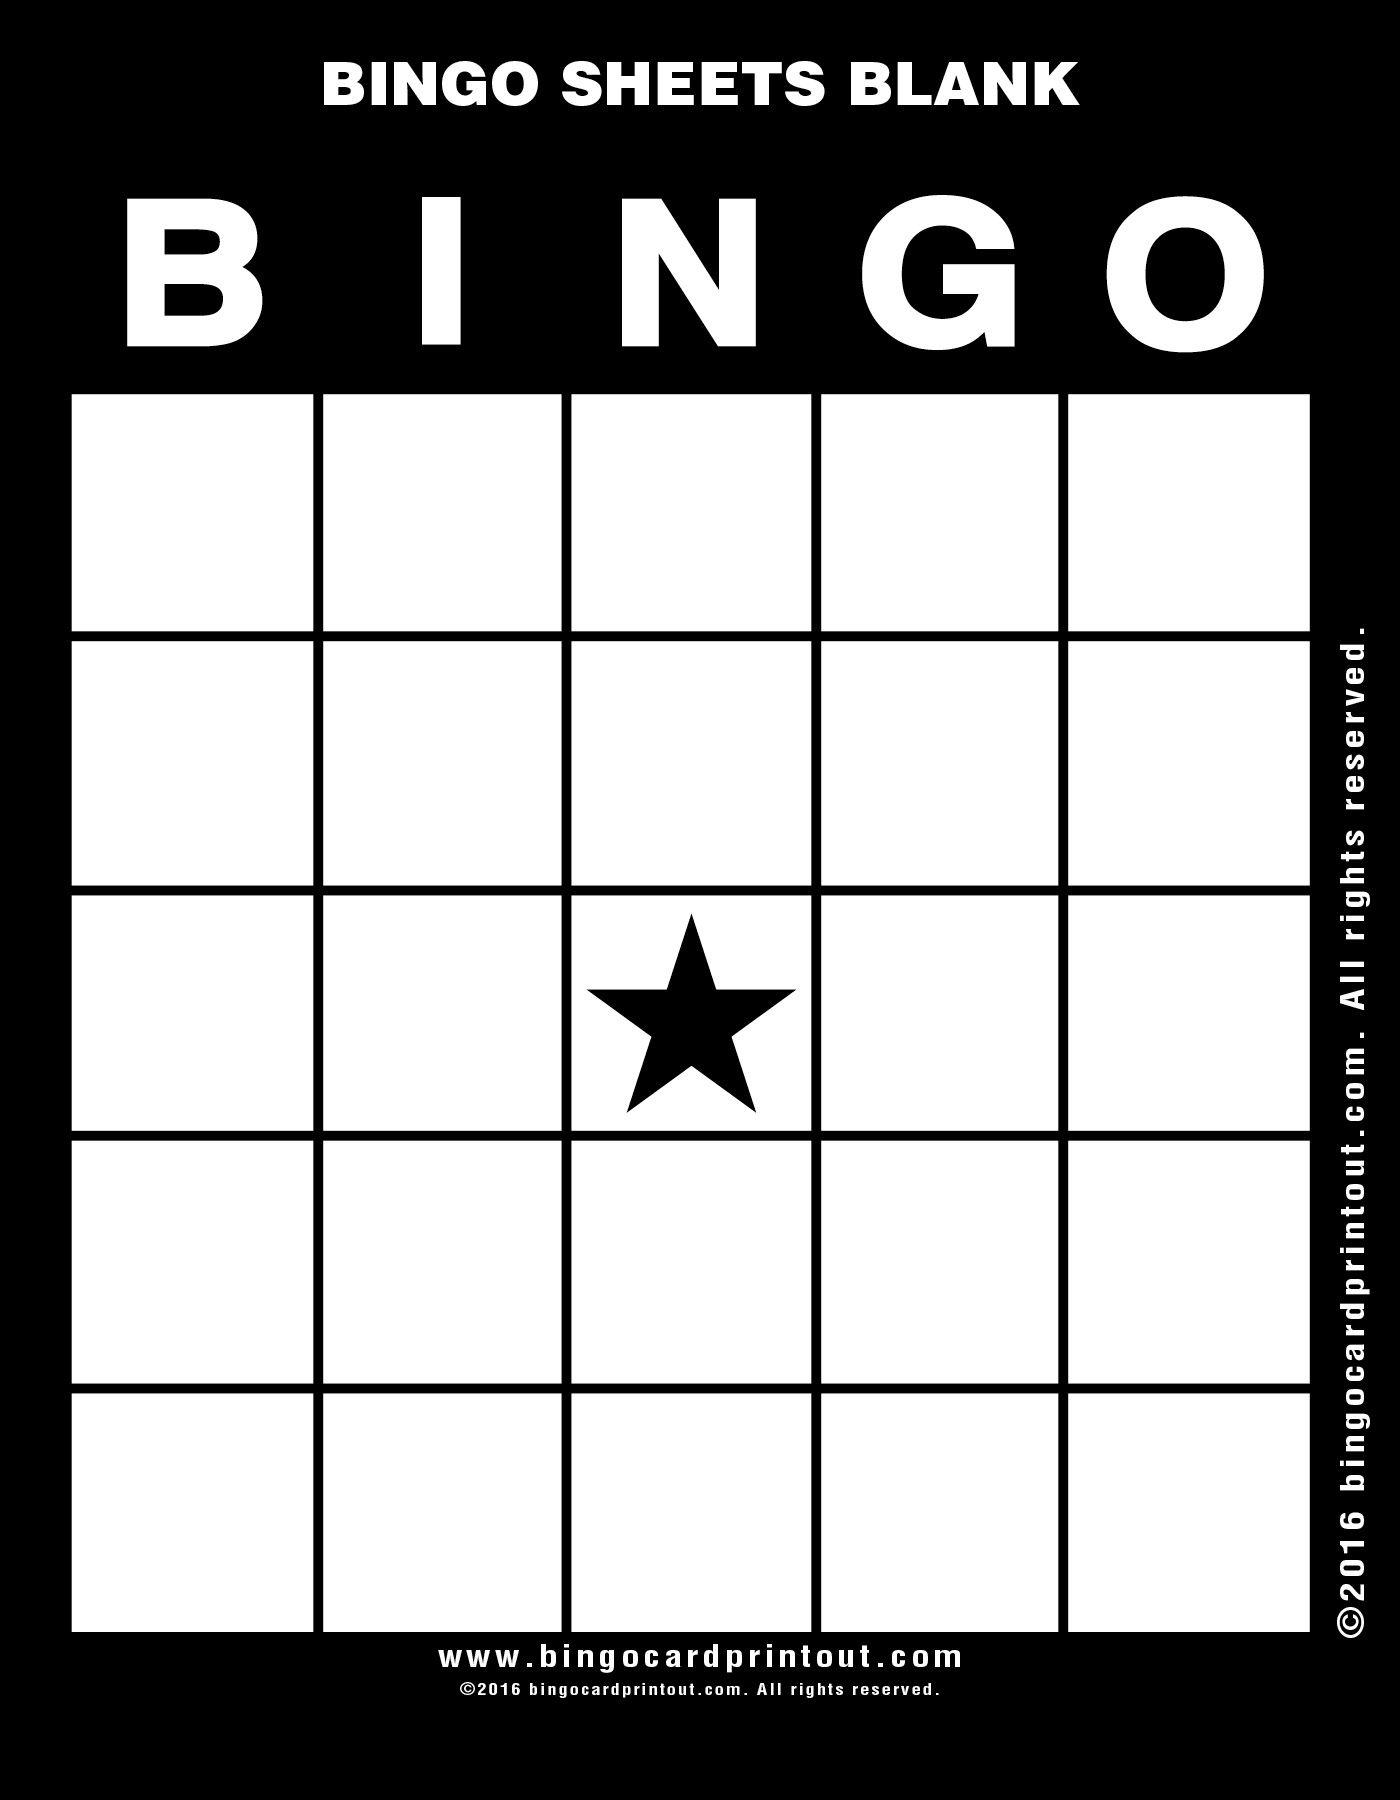 Bingo Sheets Blank 11 | Bingo Sheets Blank | Pinterest